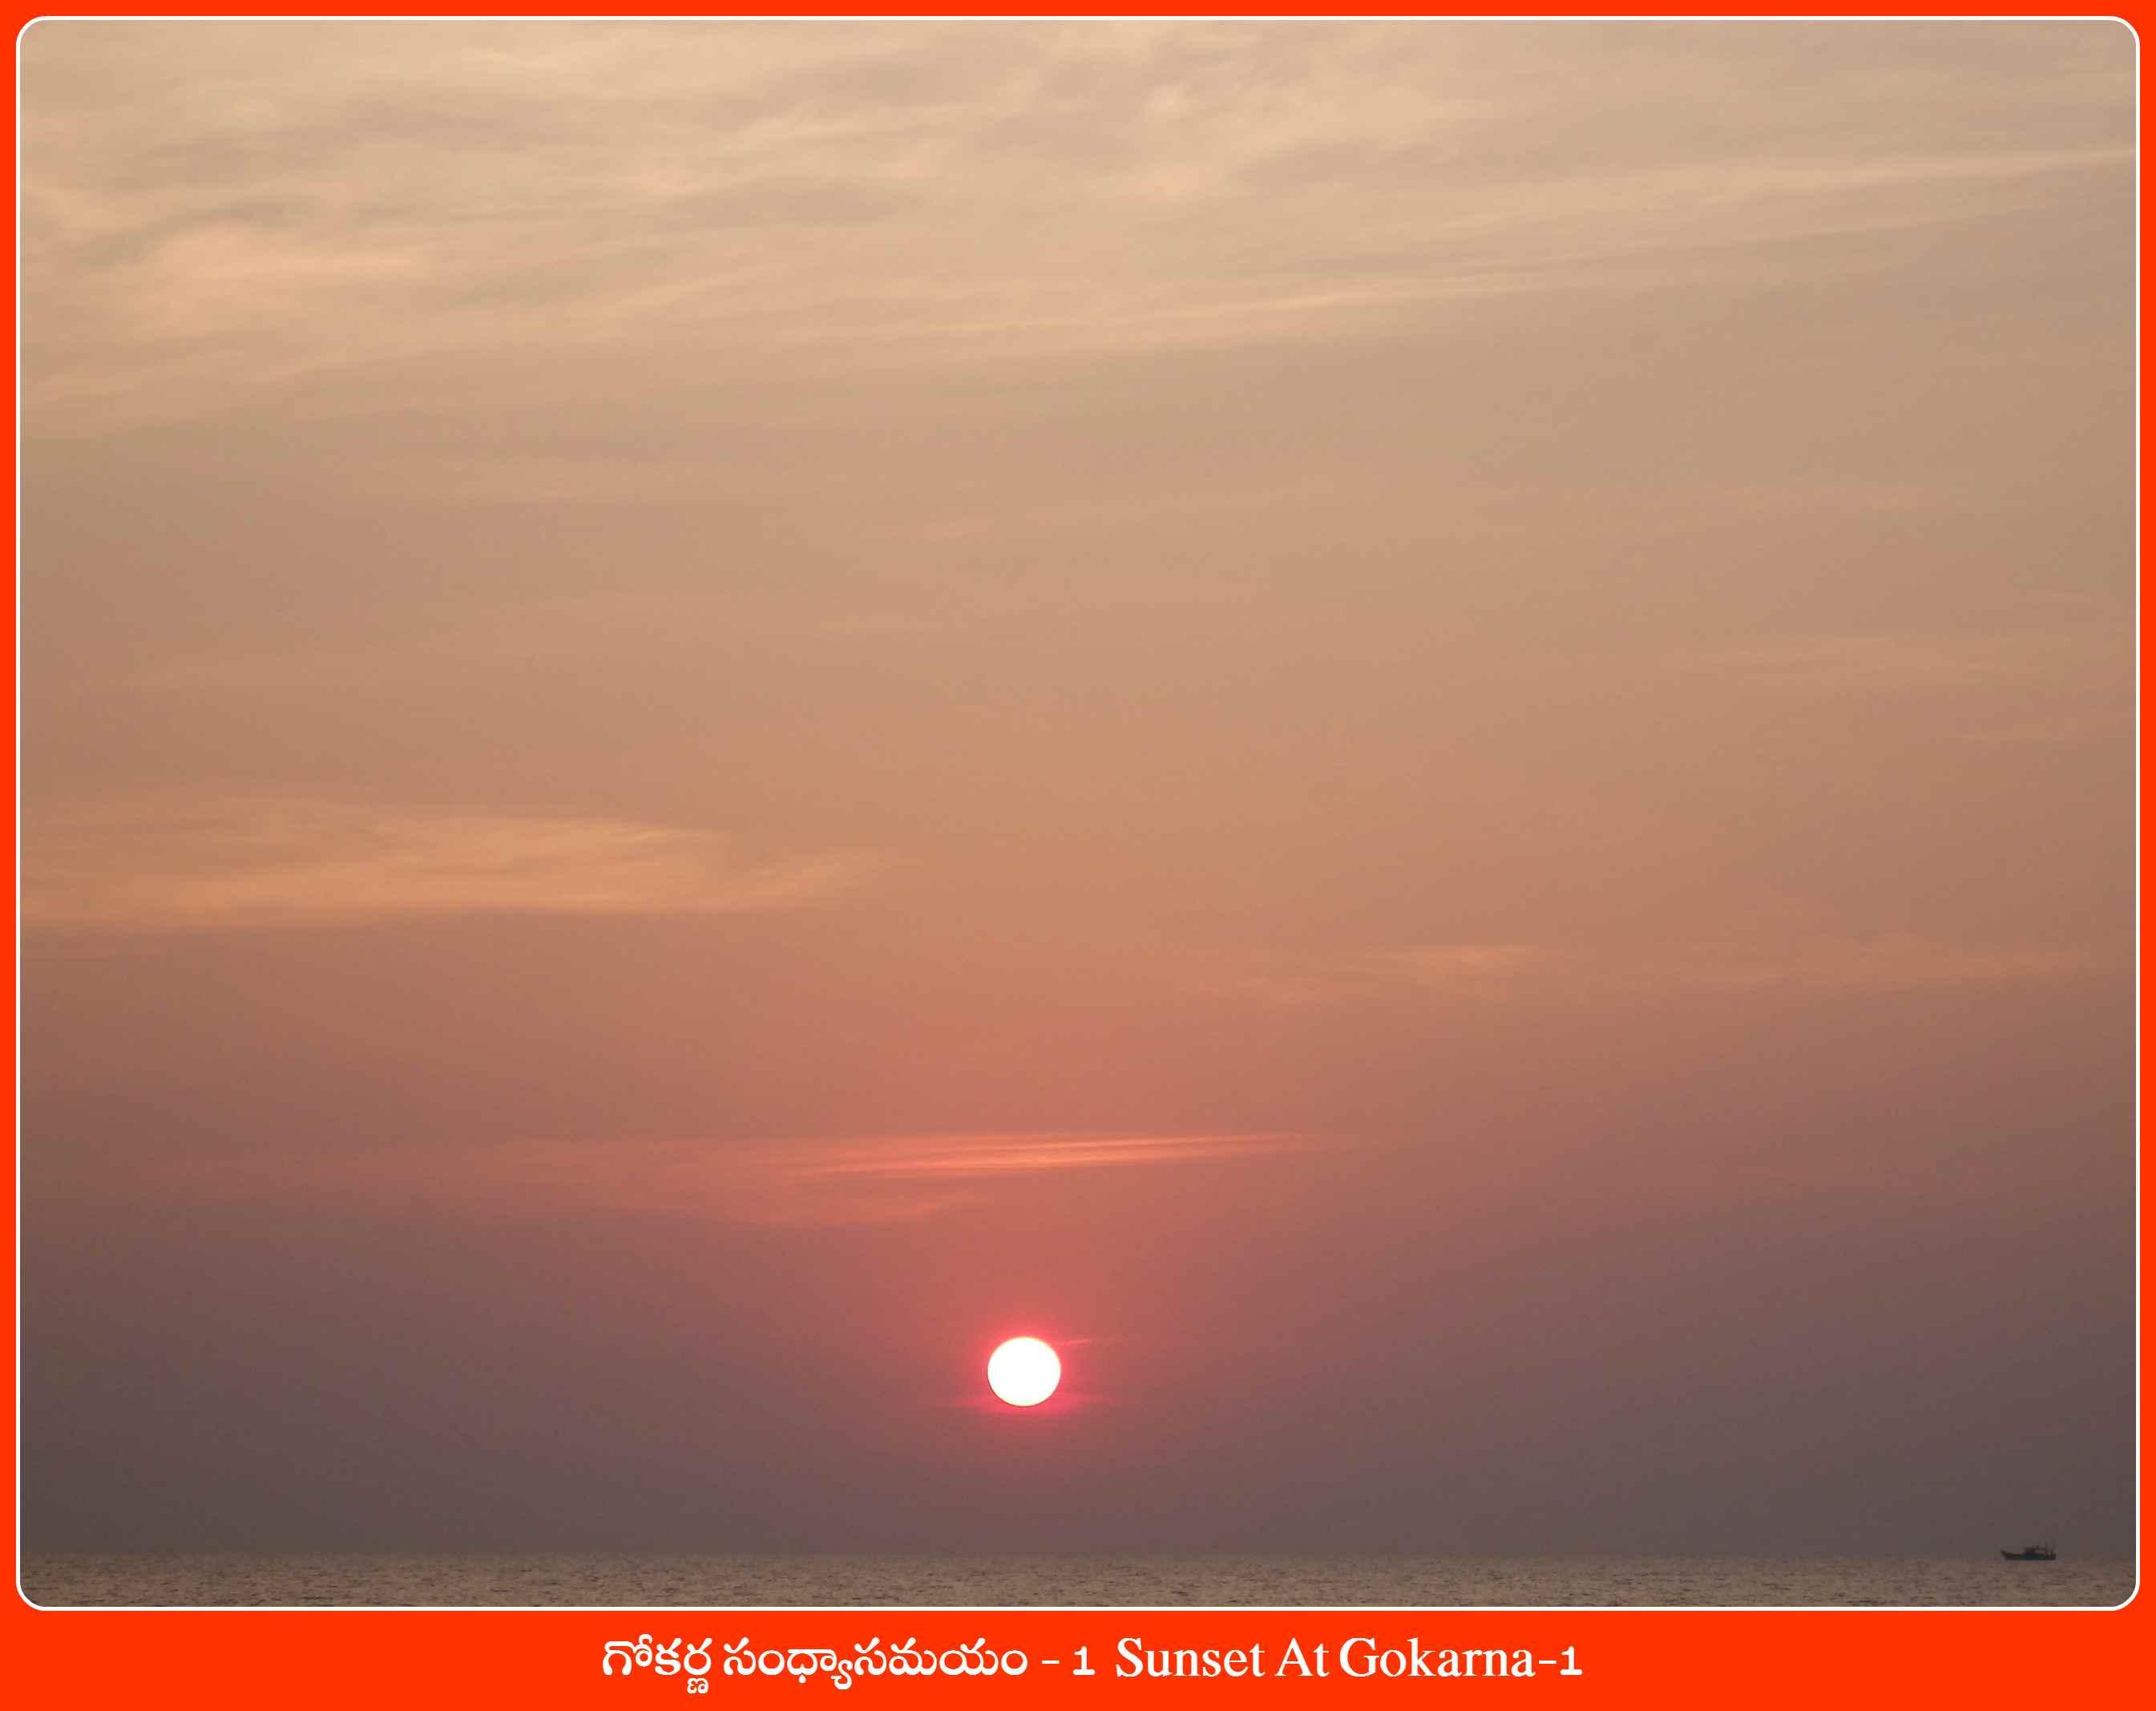 Sunset At Gokarna-1